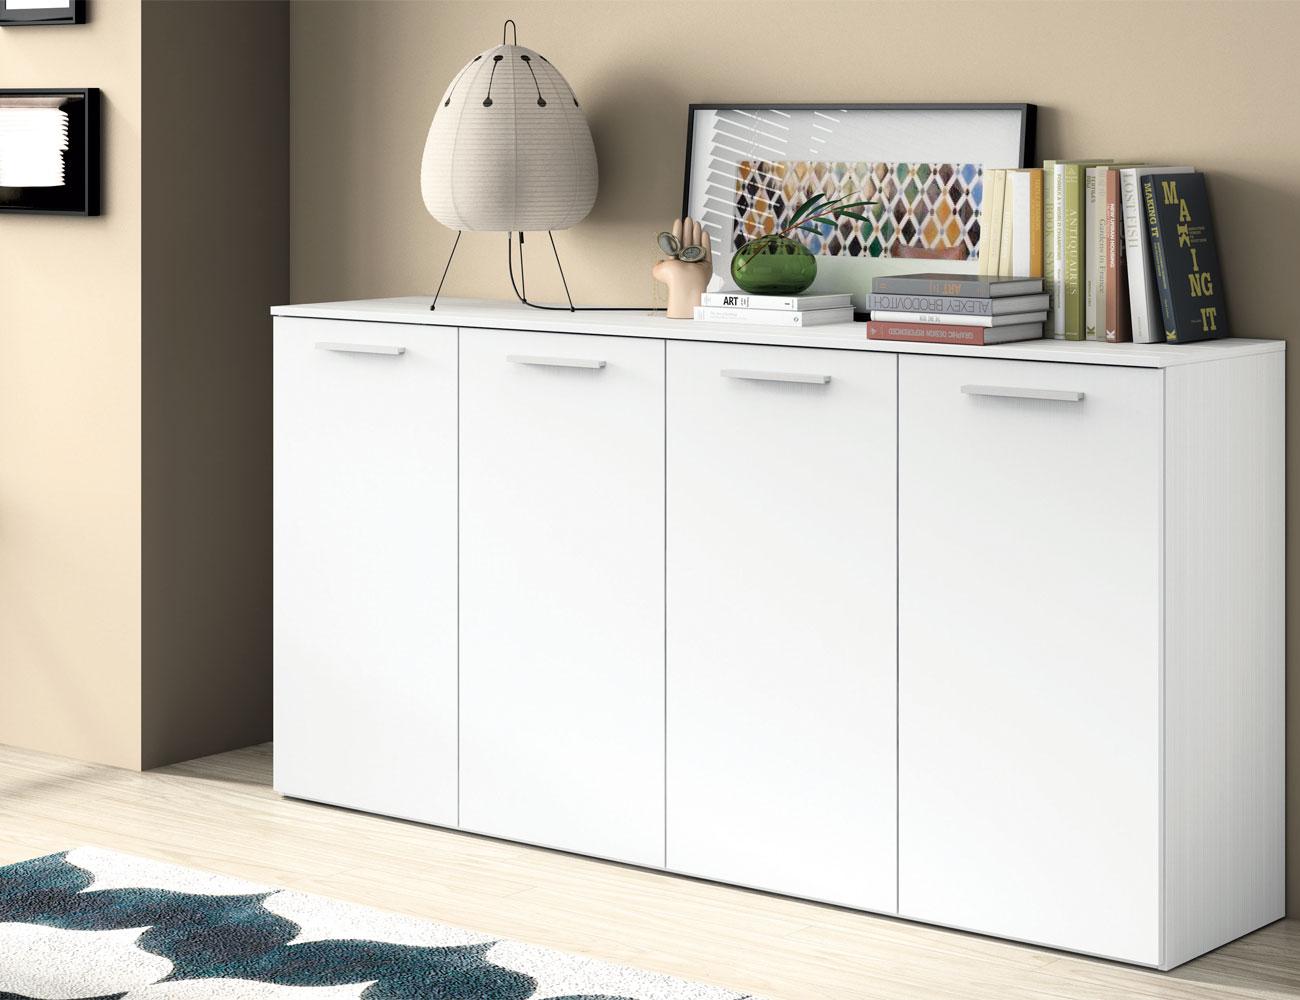 Mueble salon moderno aparador blanco 4145